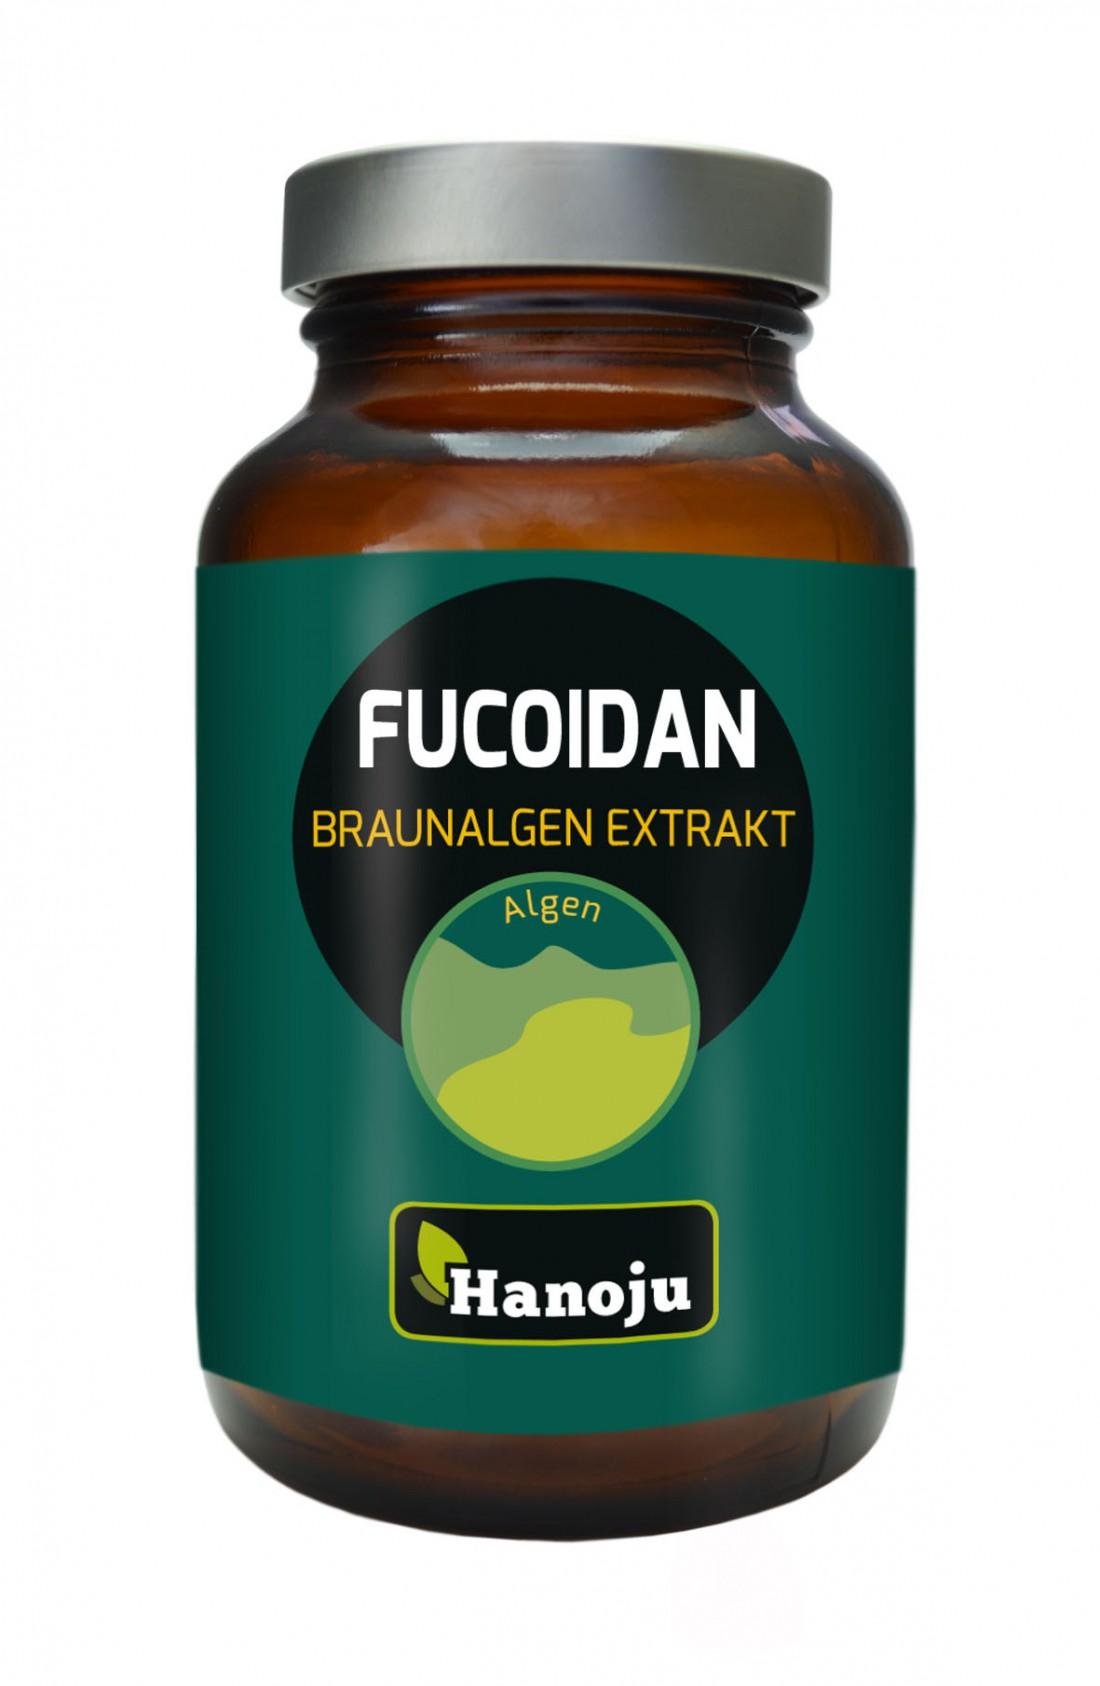 Fucoidan-Braunalgen